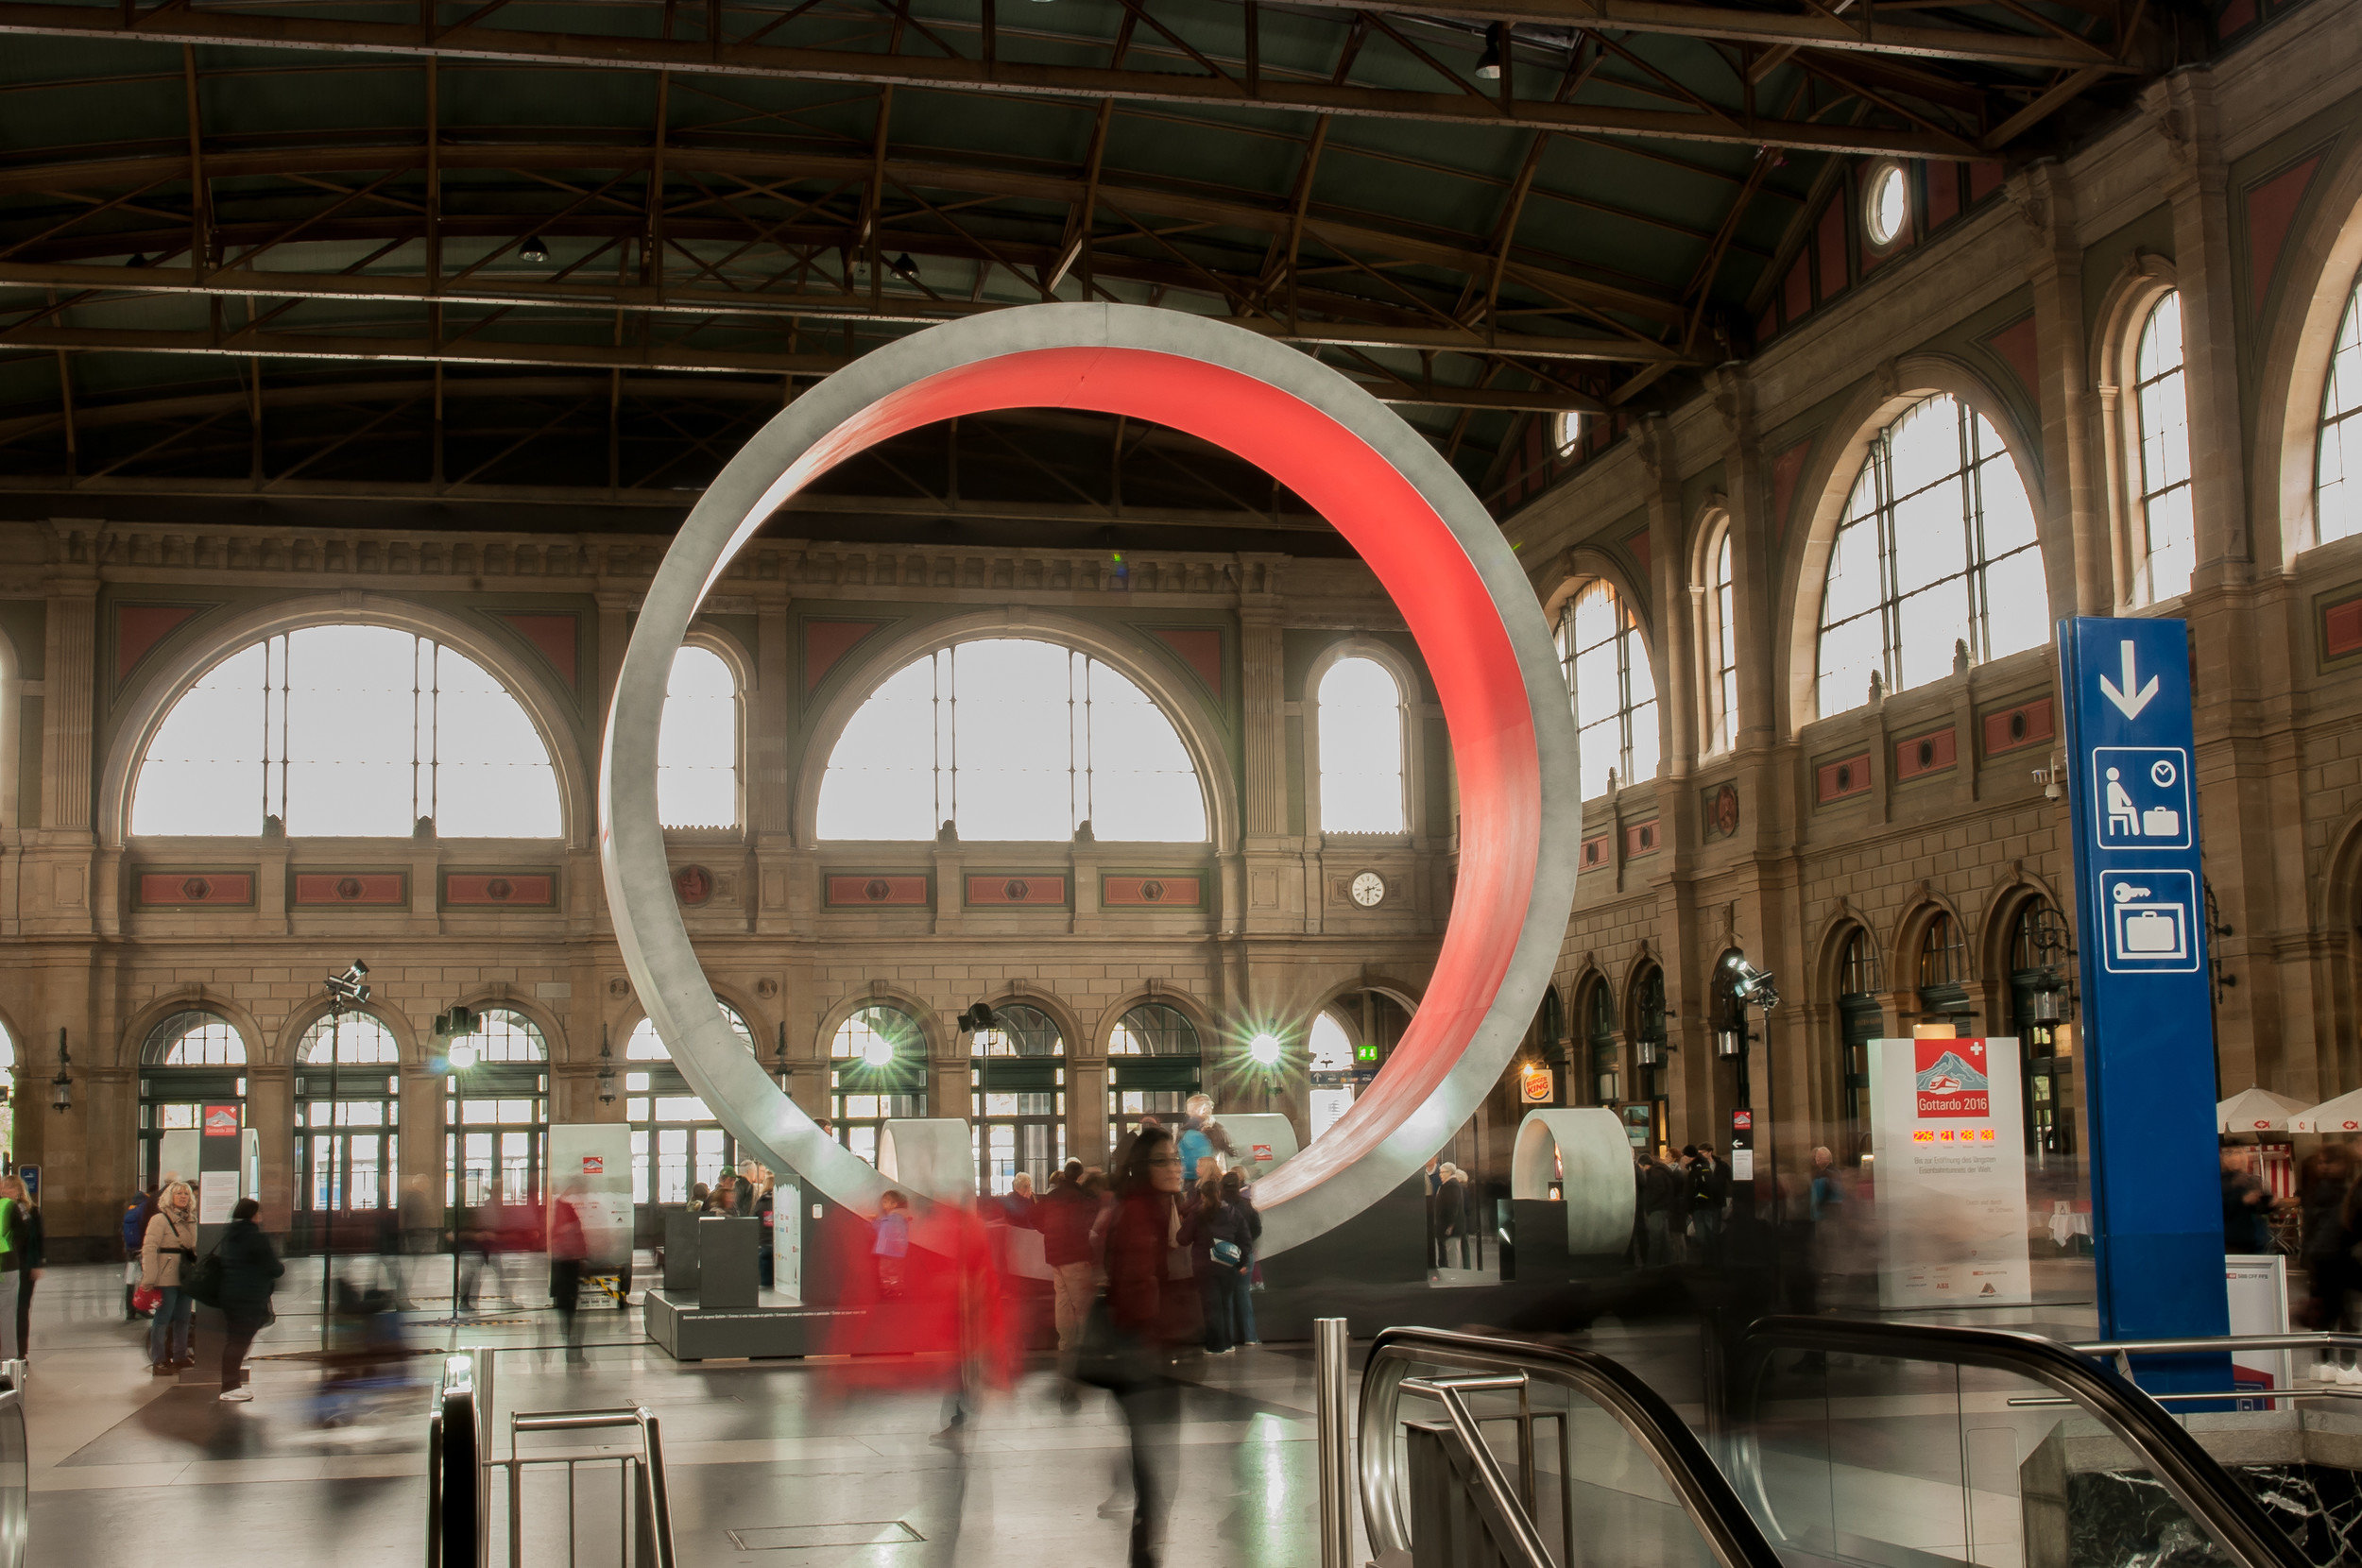 Grosser Betonring von innen rot beleuchtet in Bahnhofshalle